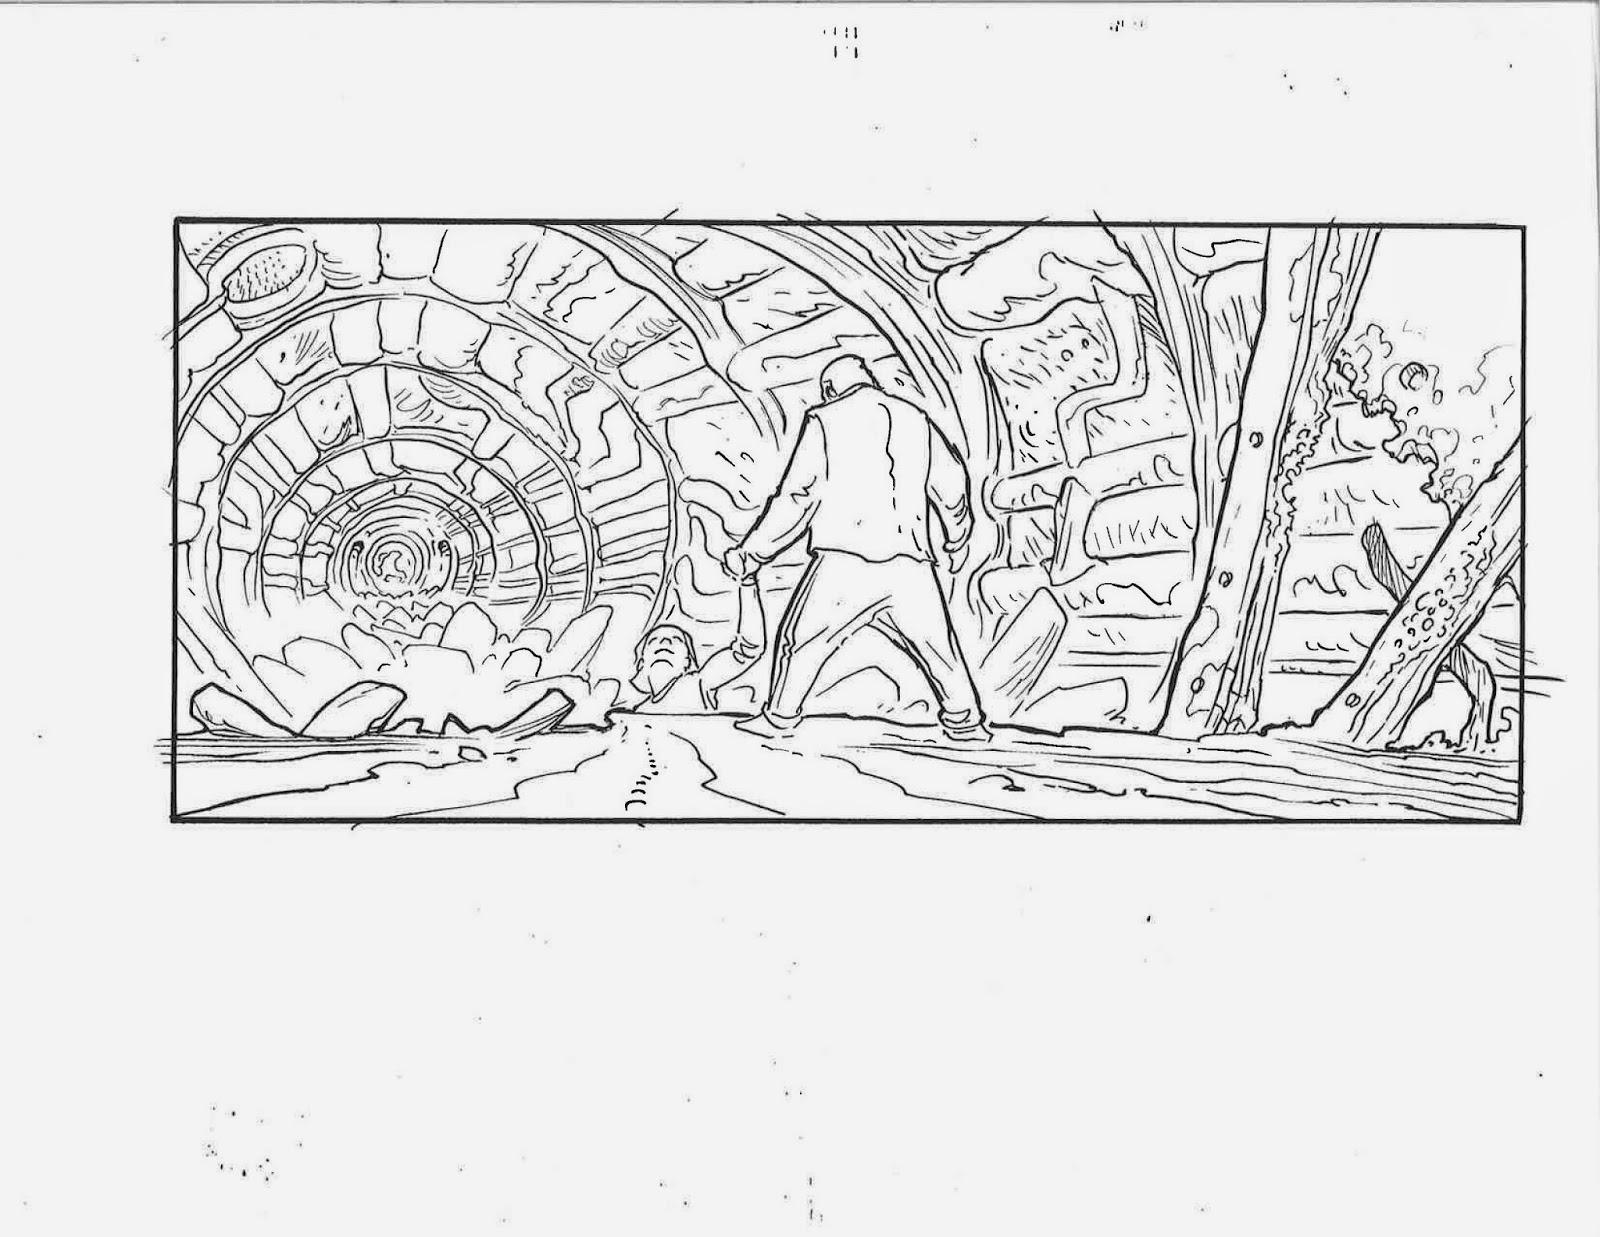 Ricardo Delgado's blog: Matrix storyboards: Neo in the